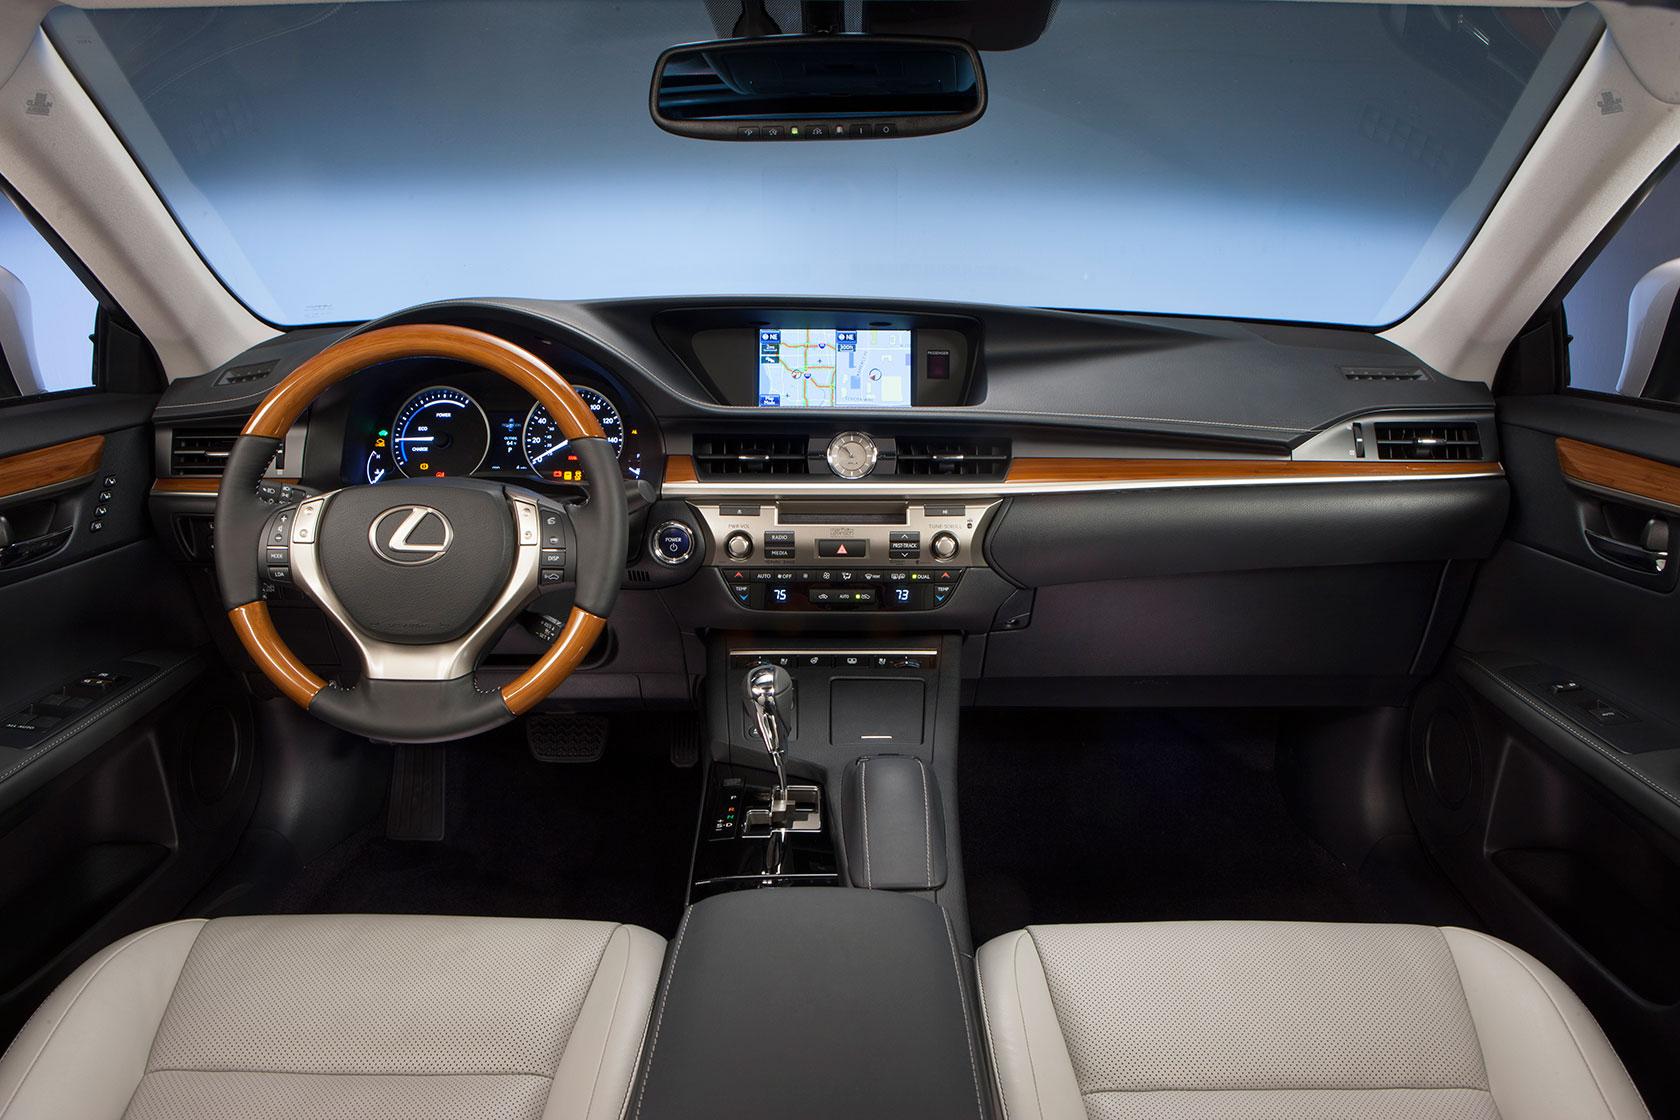 2013 Lexus ES Hybrid Dashboard